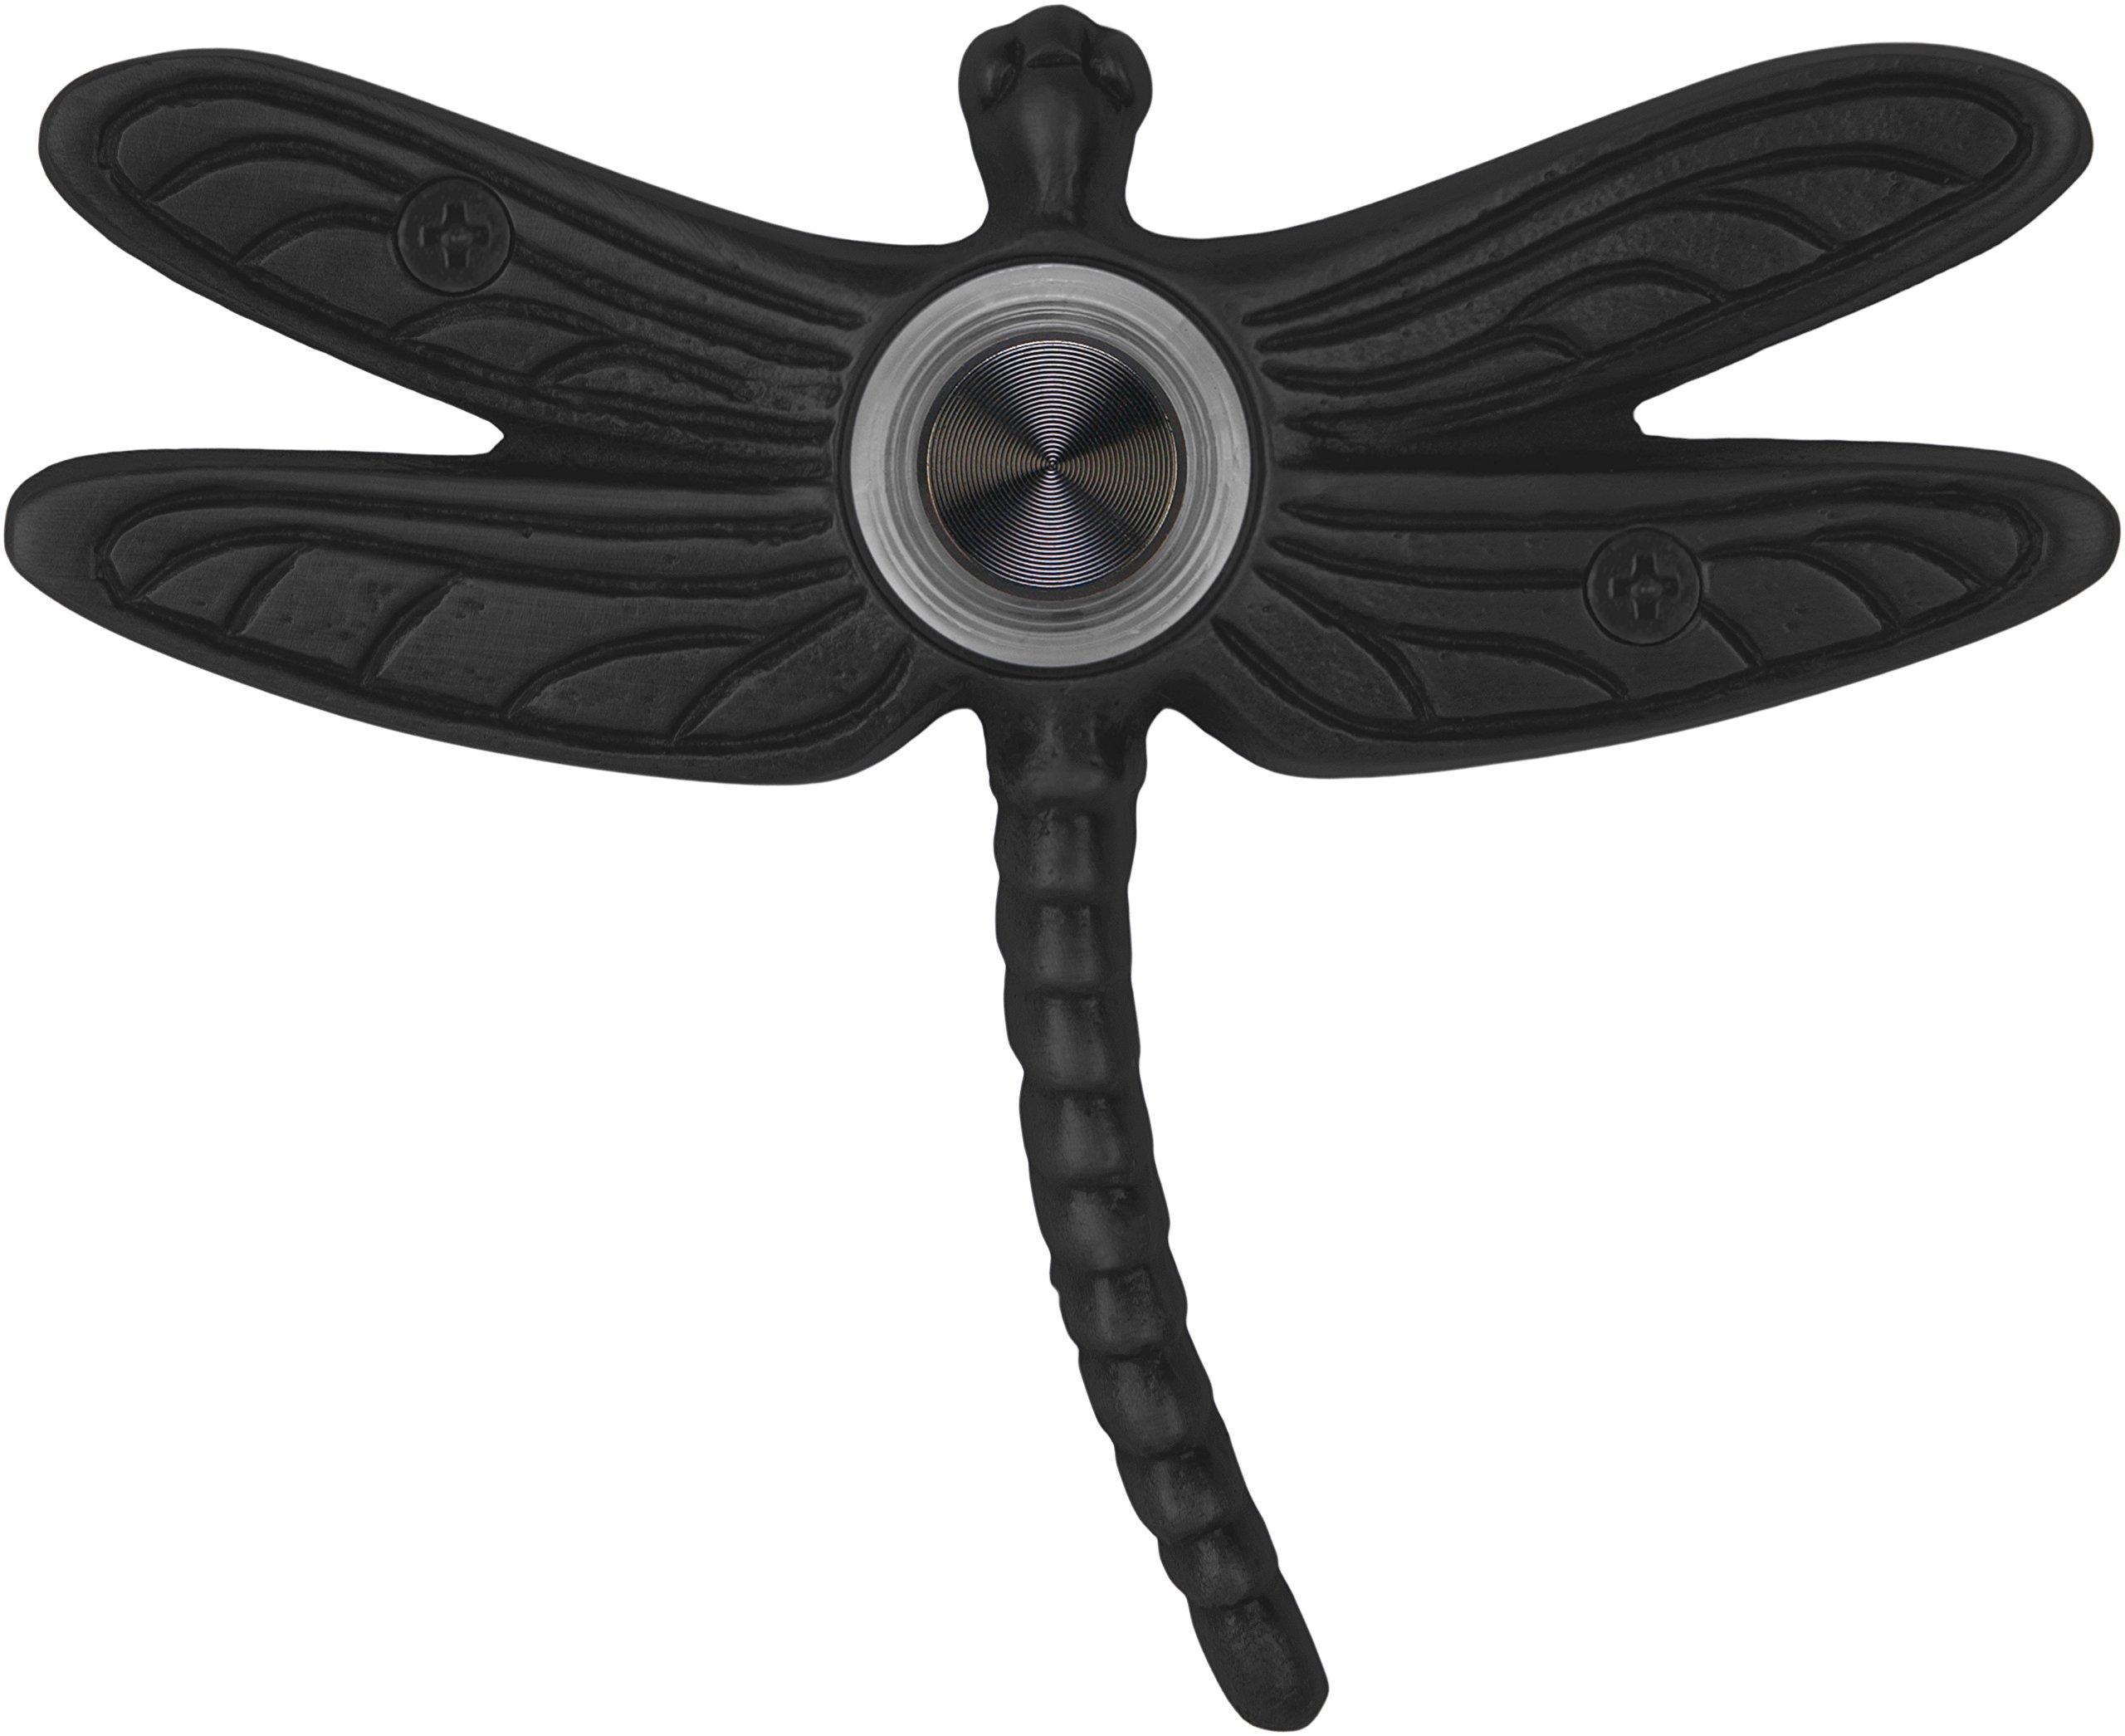 Waterwood Solid Brass Summer Dragonfly Doorbell in Black